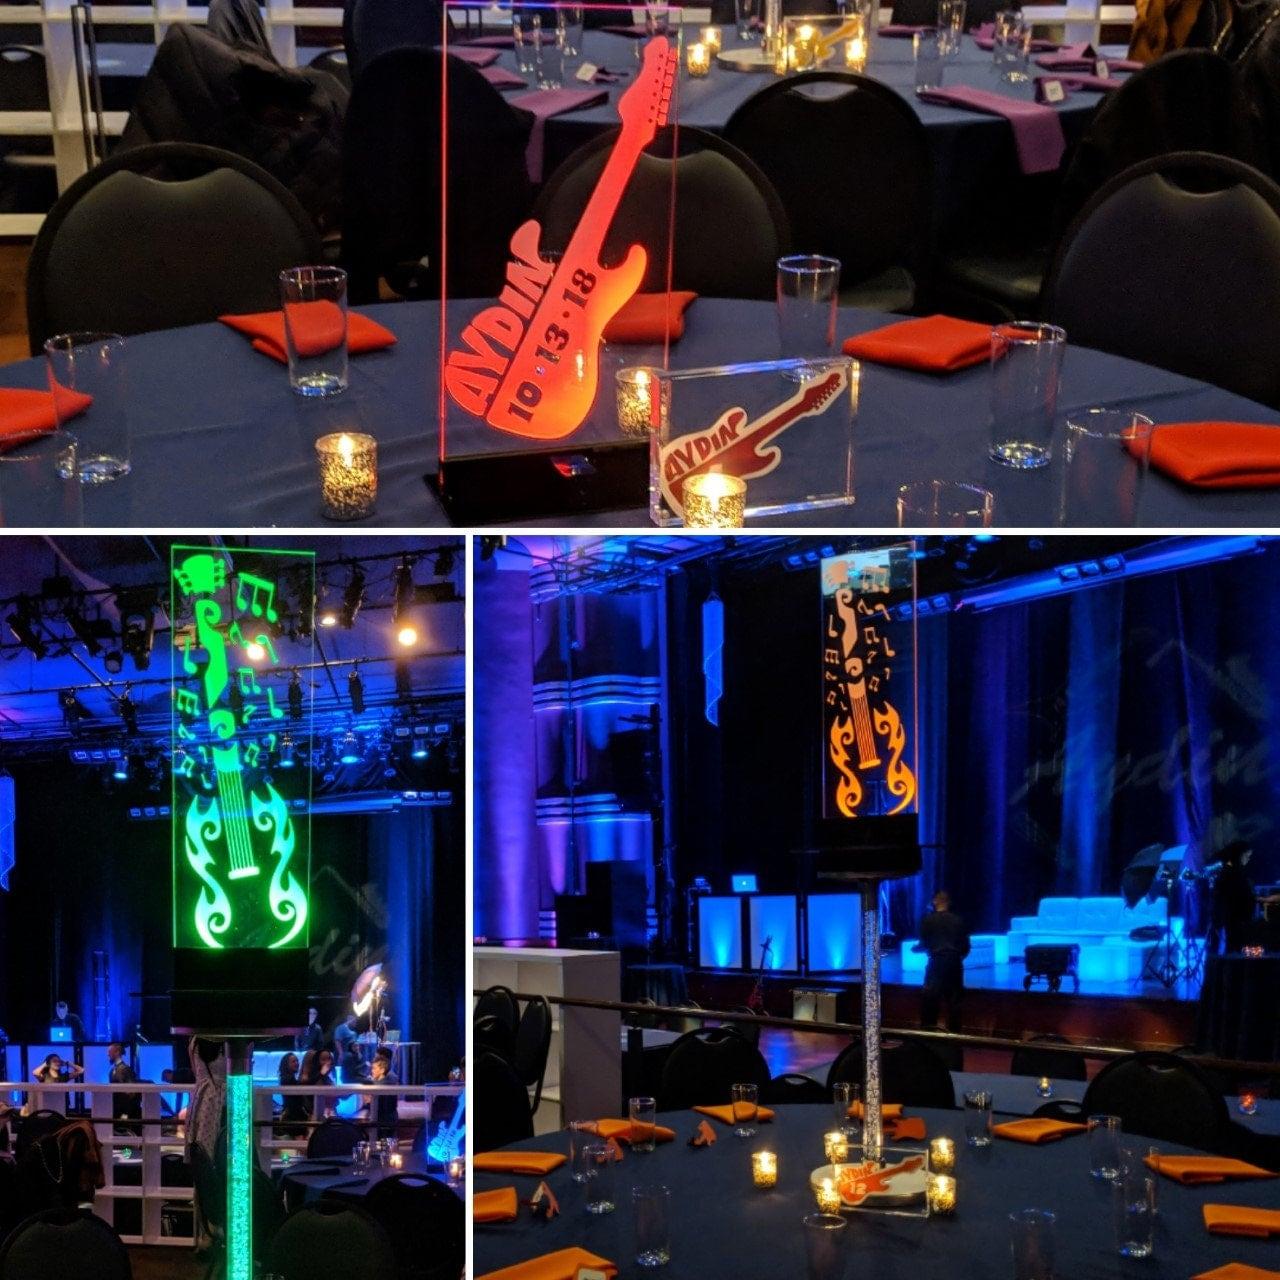 Astounding Music Theme Illuminated Glow Centerpiece Bar Bat Mitzvah Best Image Libraries Weasiibadanjobscom